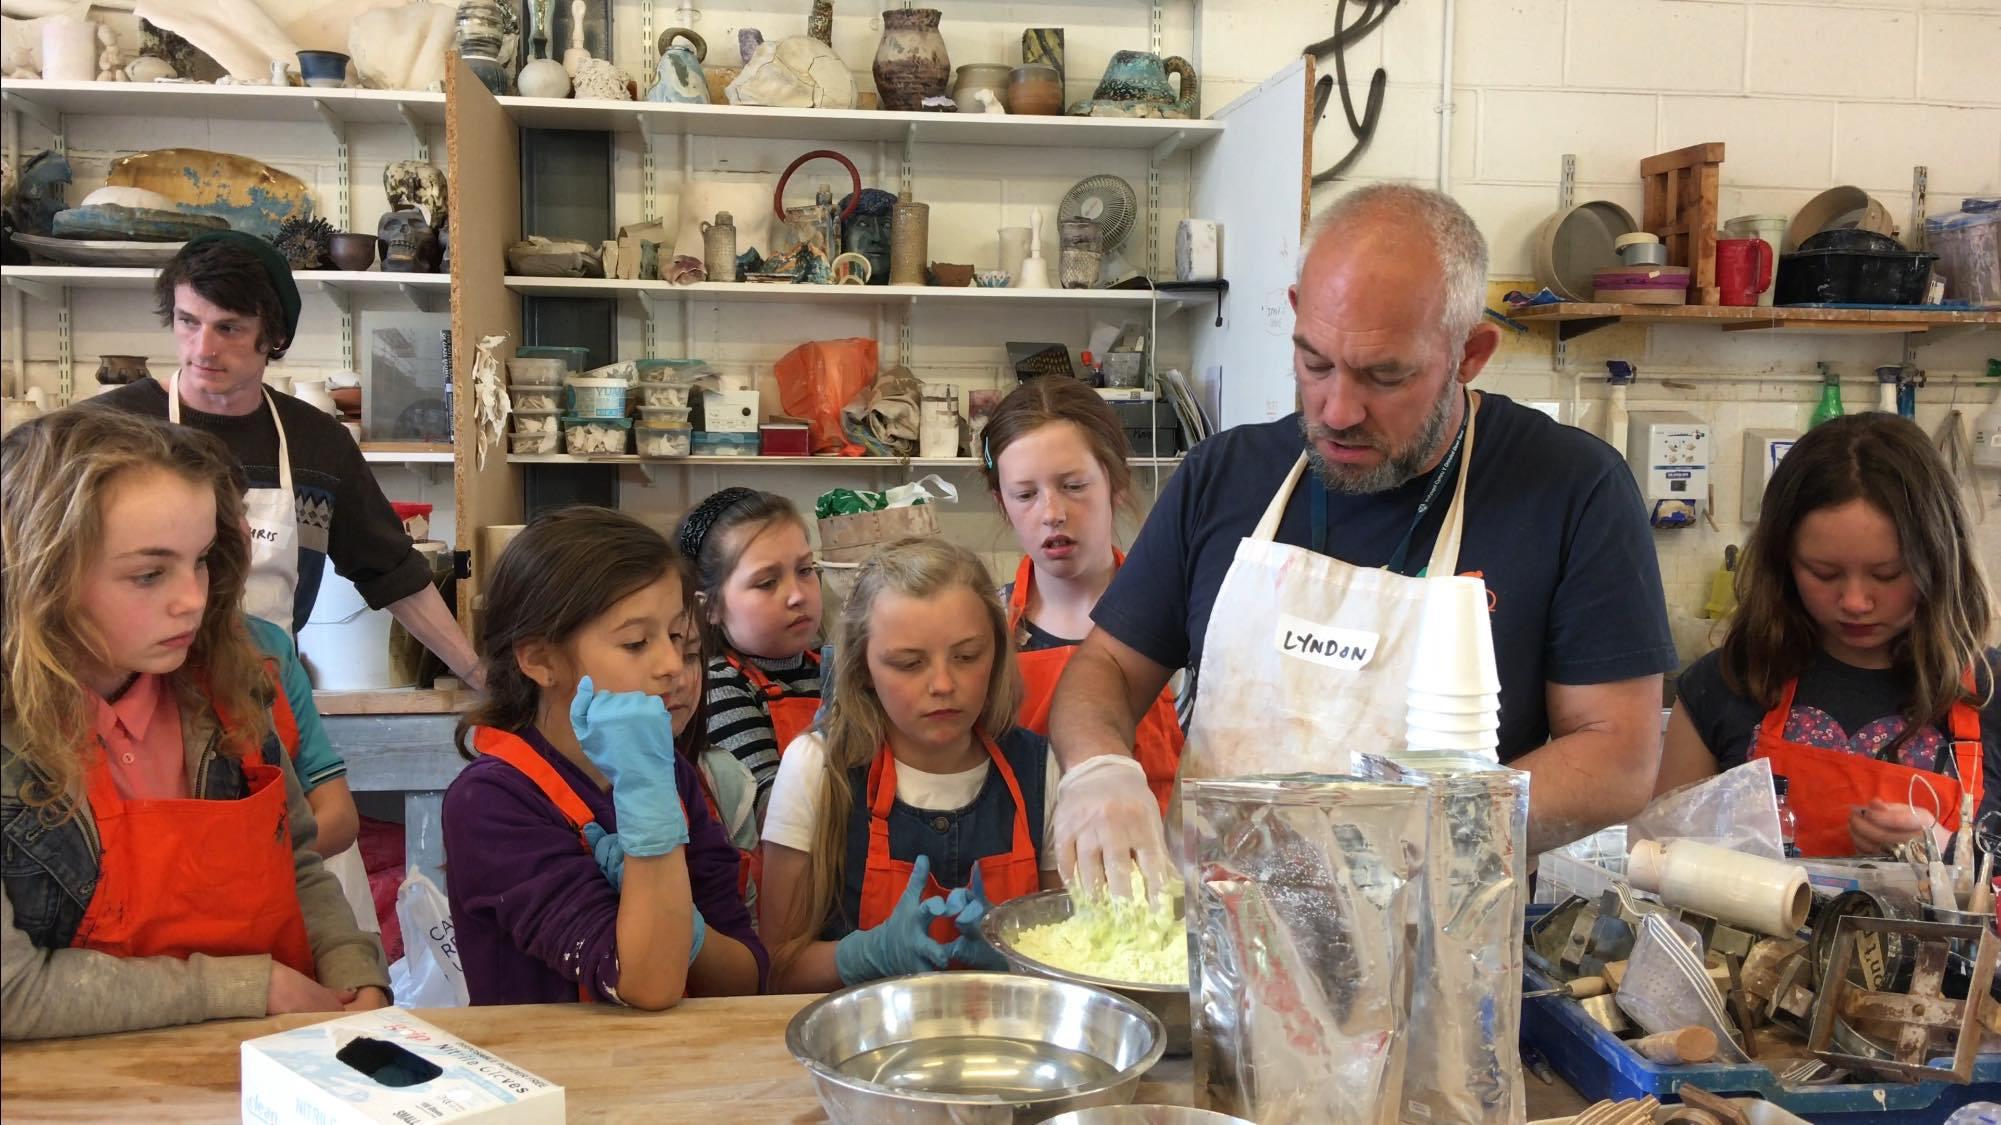 Ceramics masterclass with Lyndon Davies